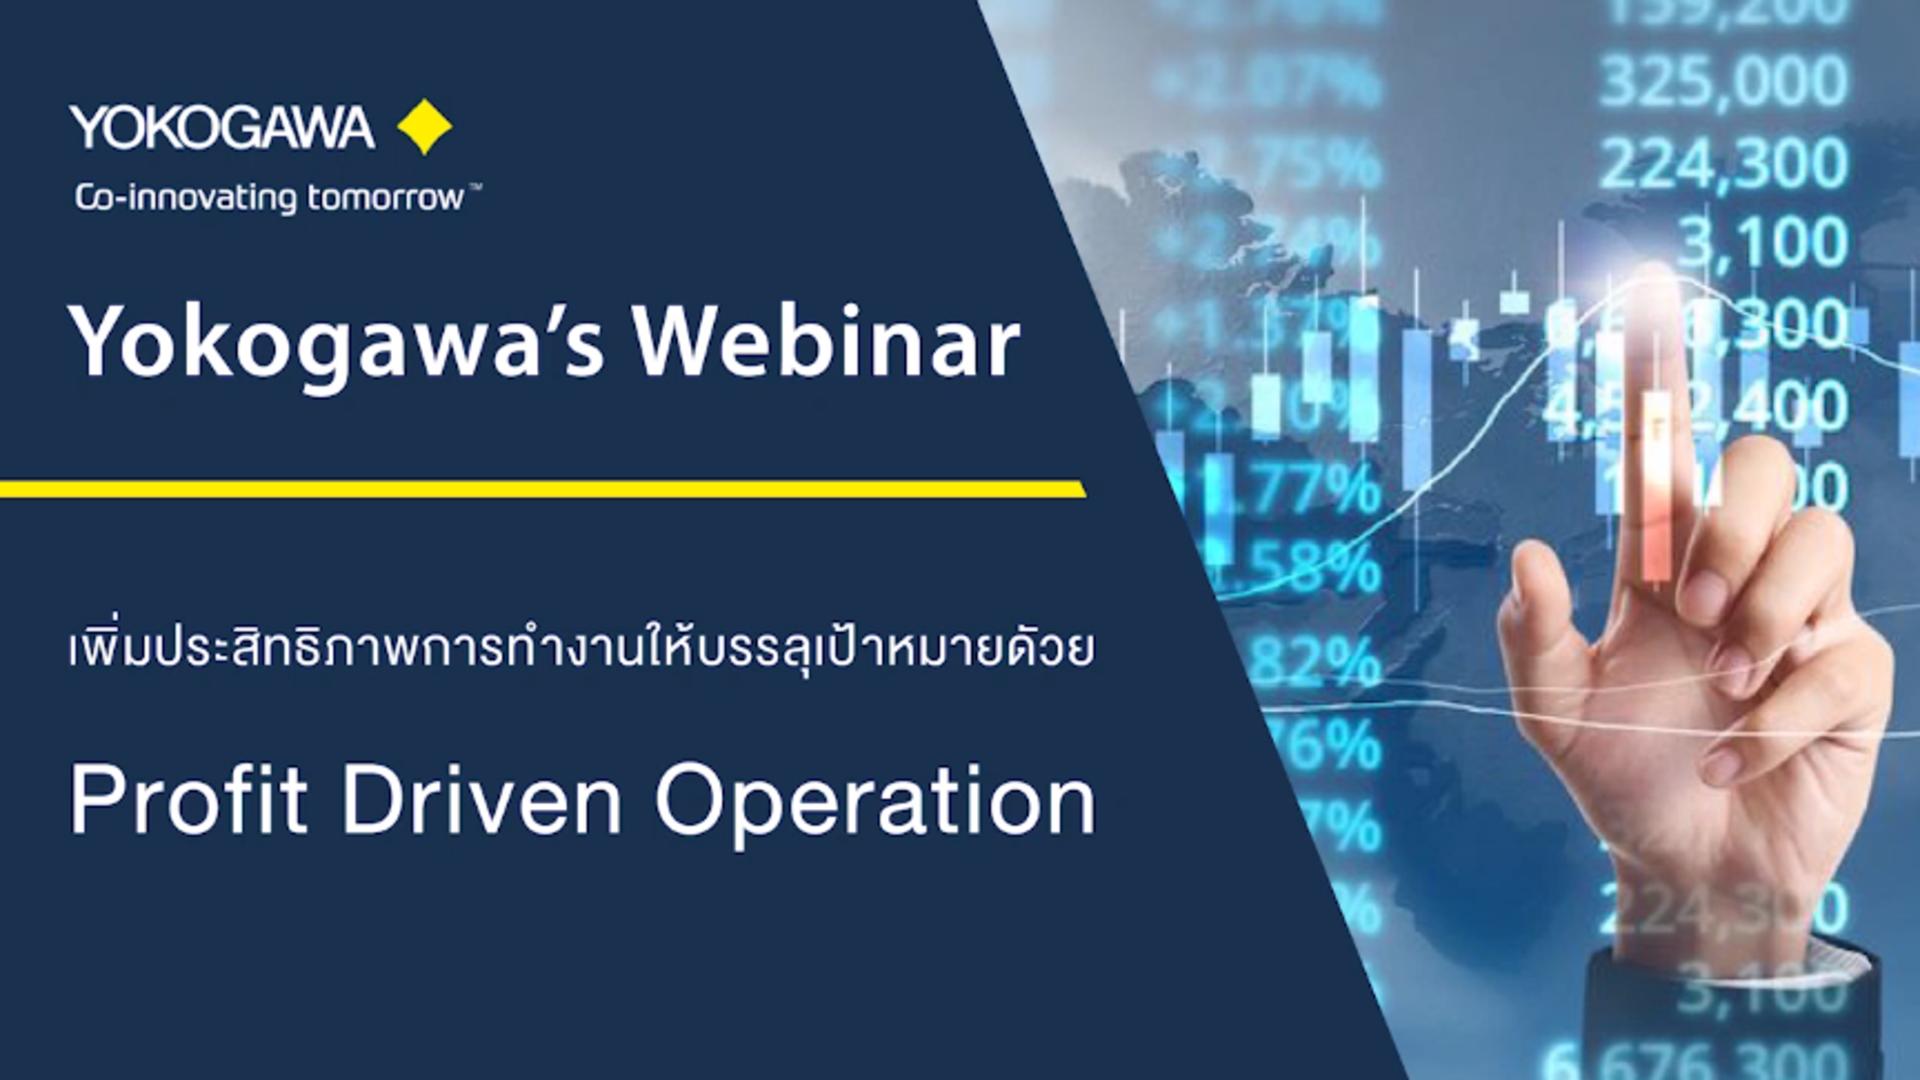 Yokogawa's Webinar : เพิ่มประสิทธิภาพการทำงานให้บรรลุเป้าหมายด้วย Profit Driven Operation